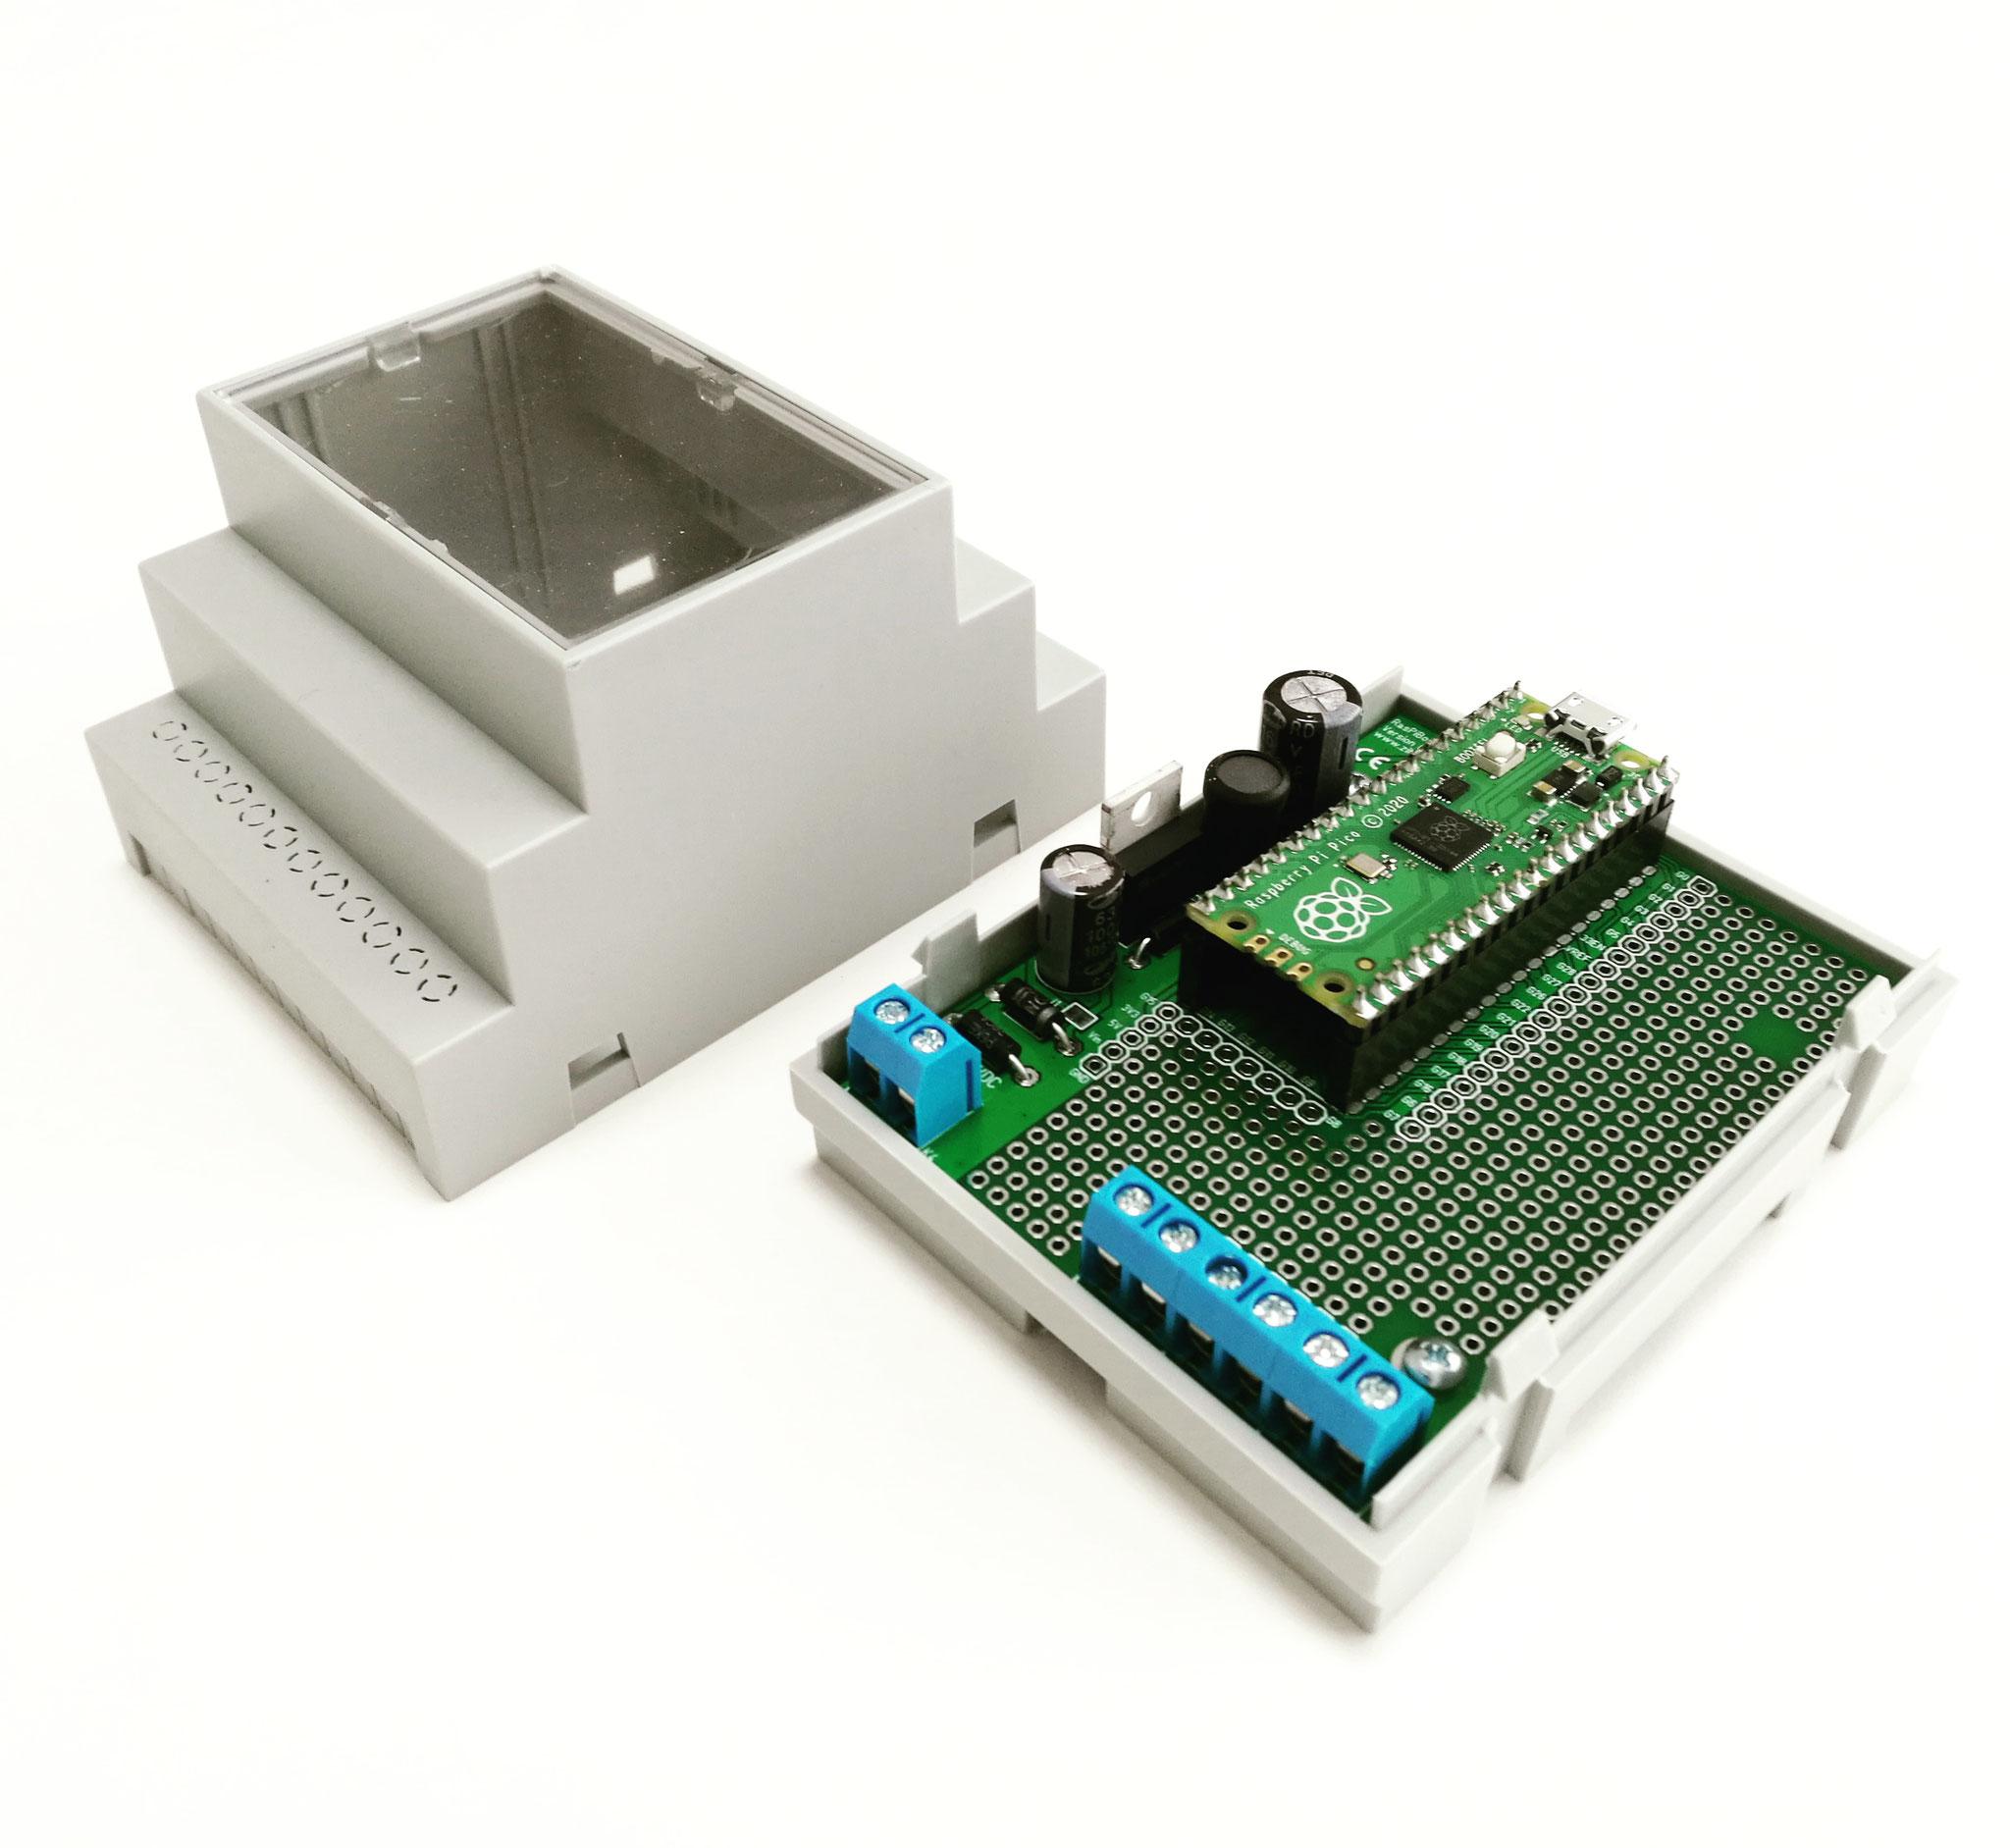 RasPiBox Pico geöffnet mit gestecktem Raspberry Pi Pico